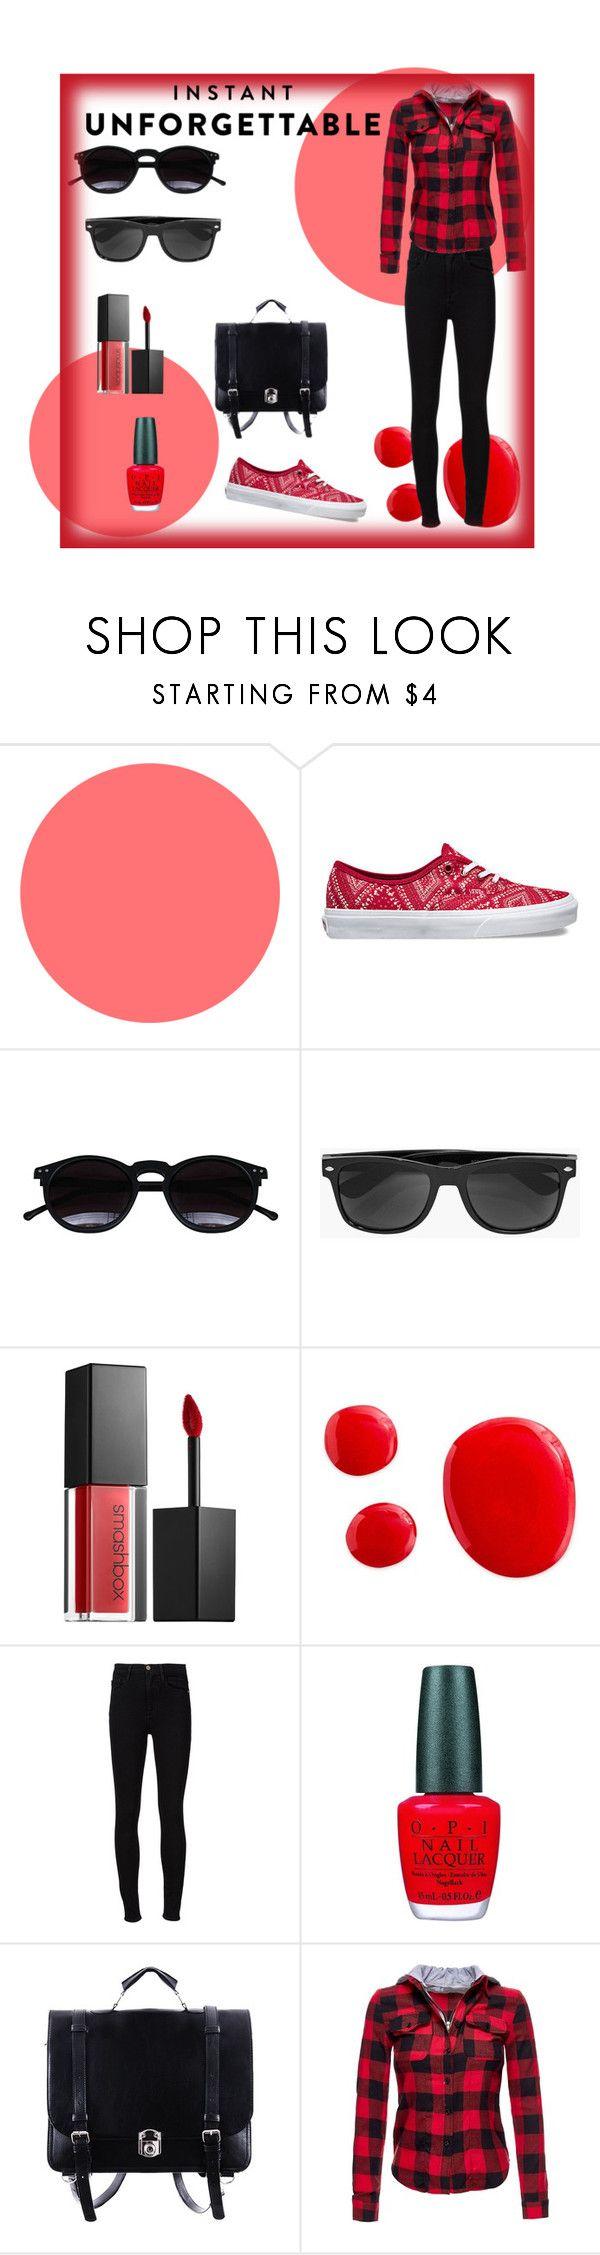 """Shades of You: Sunglass Hut Contest Entry"" by ini-ans-bg ❤ liked on Polyvore featuring Vans, Chicnova Fashion, Boohoo, Smashbox, Frame Denim, OPI and shadesofyou"